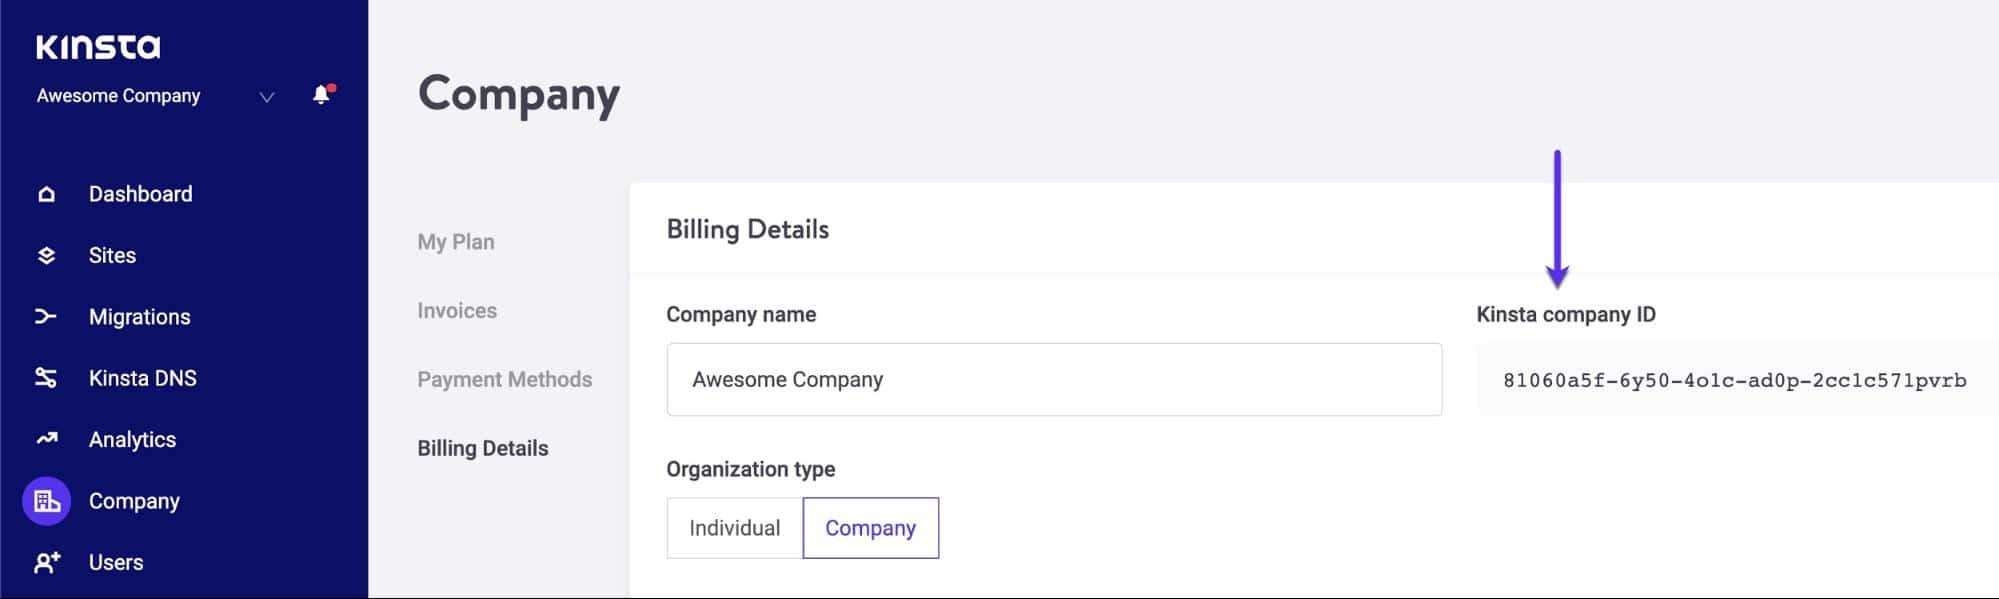 Kinsta bedrijf ID in het MyKinsta dashboard